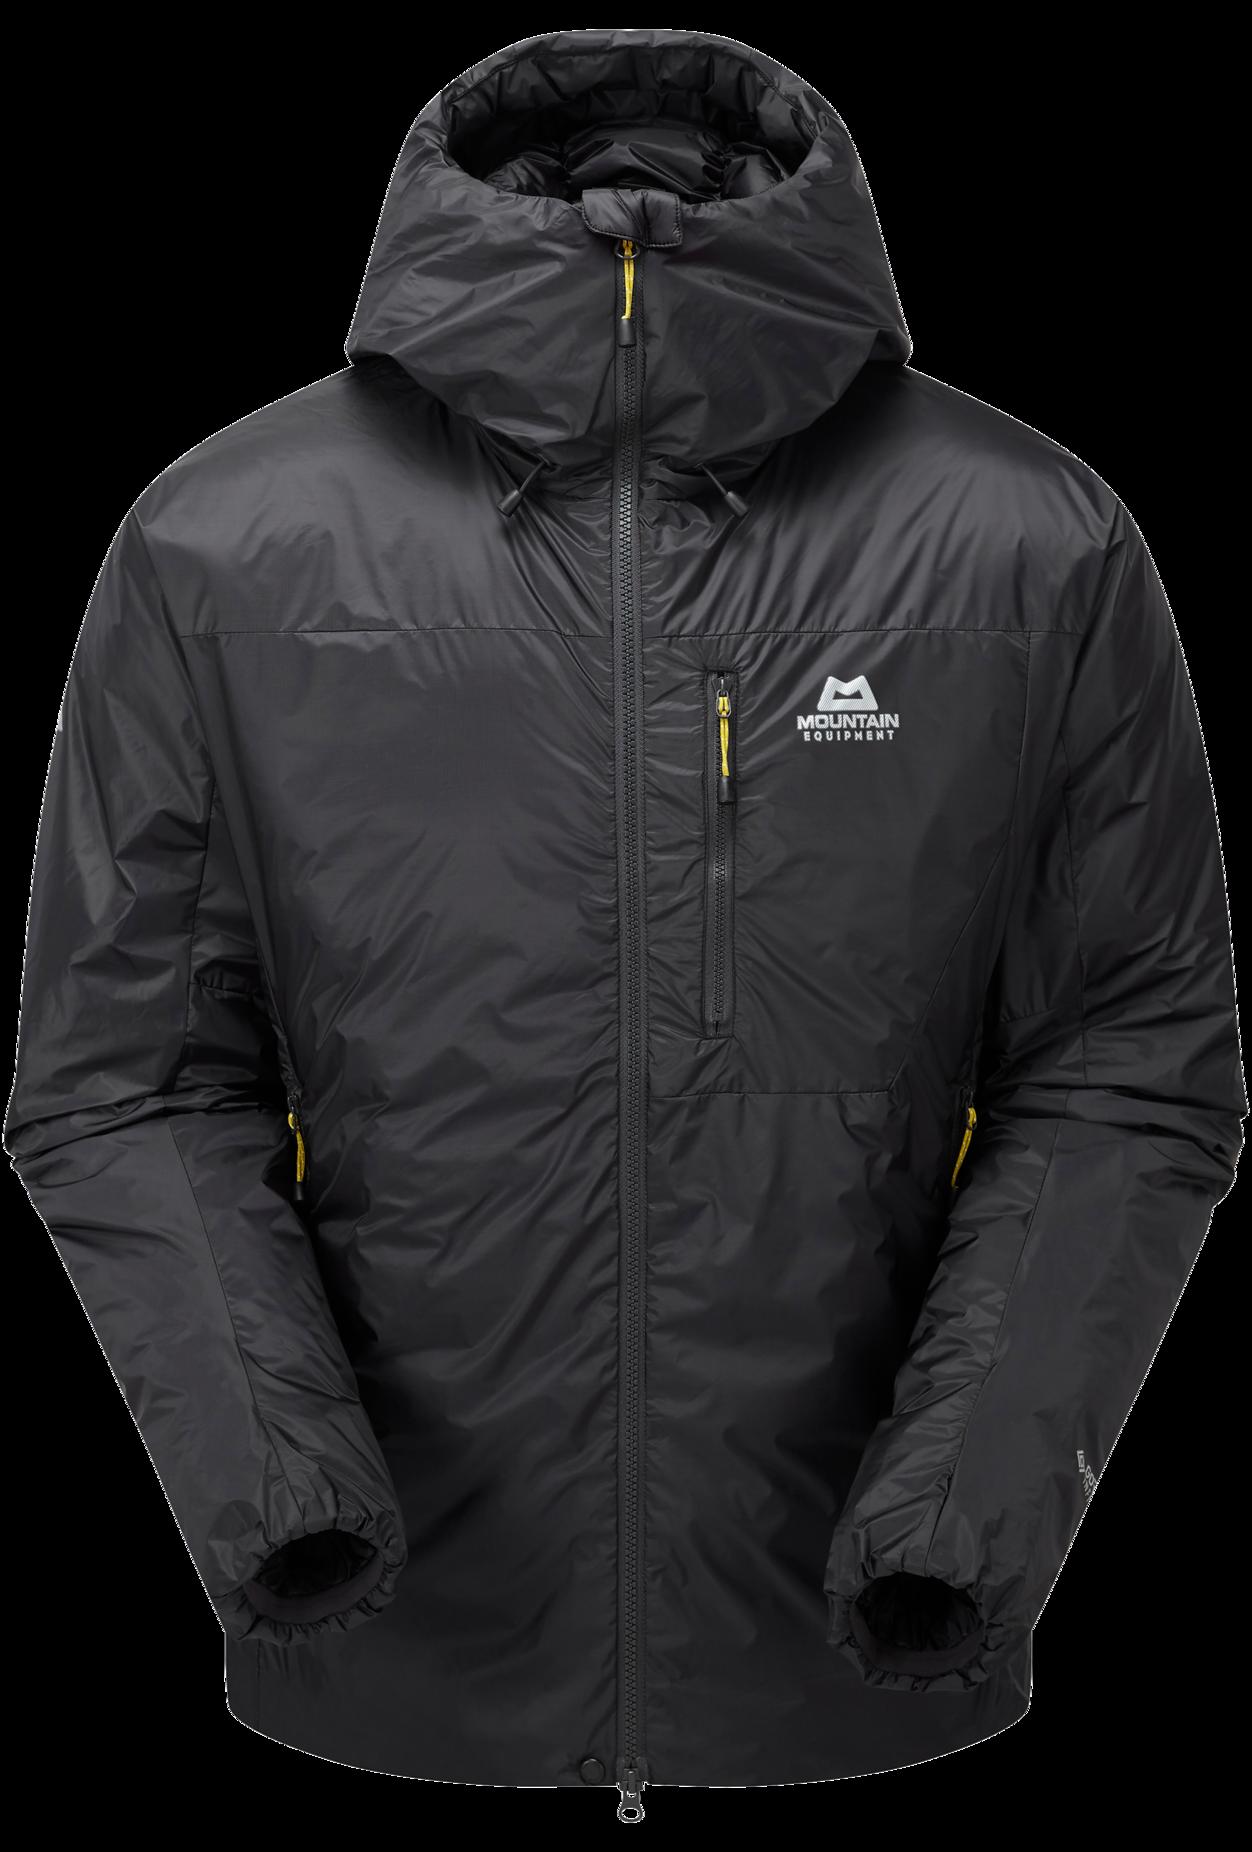 Mountain Equipment Xeros Jacket, M's